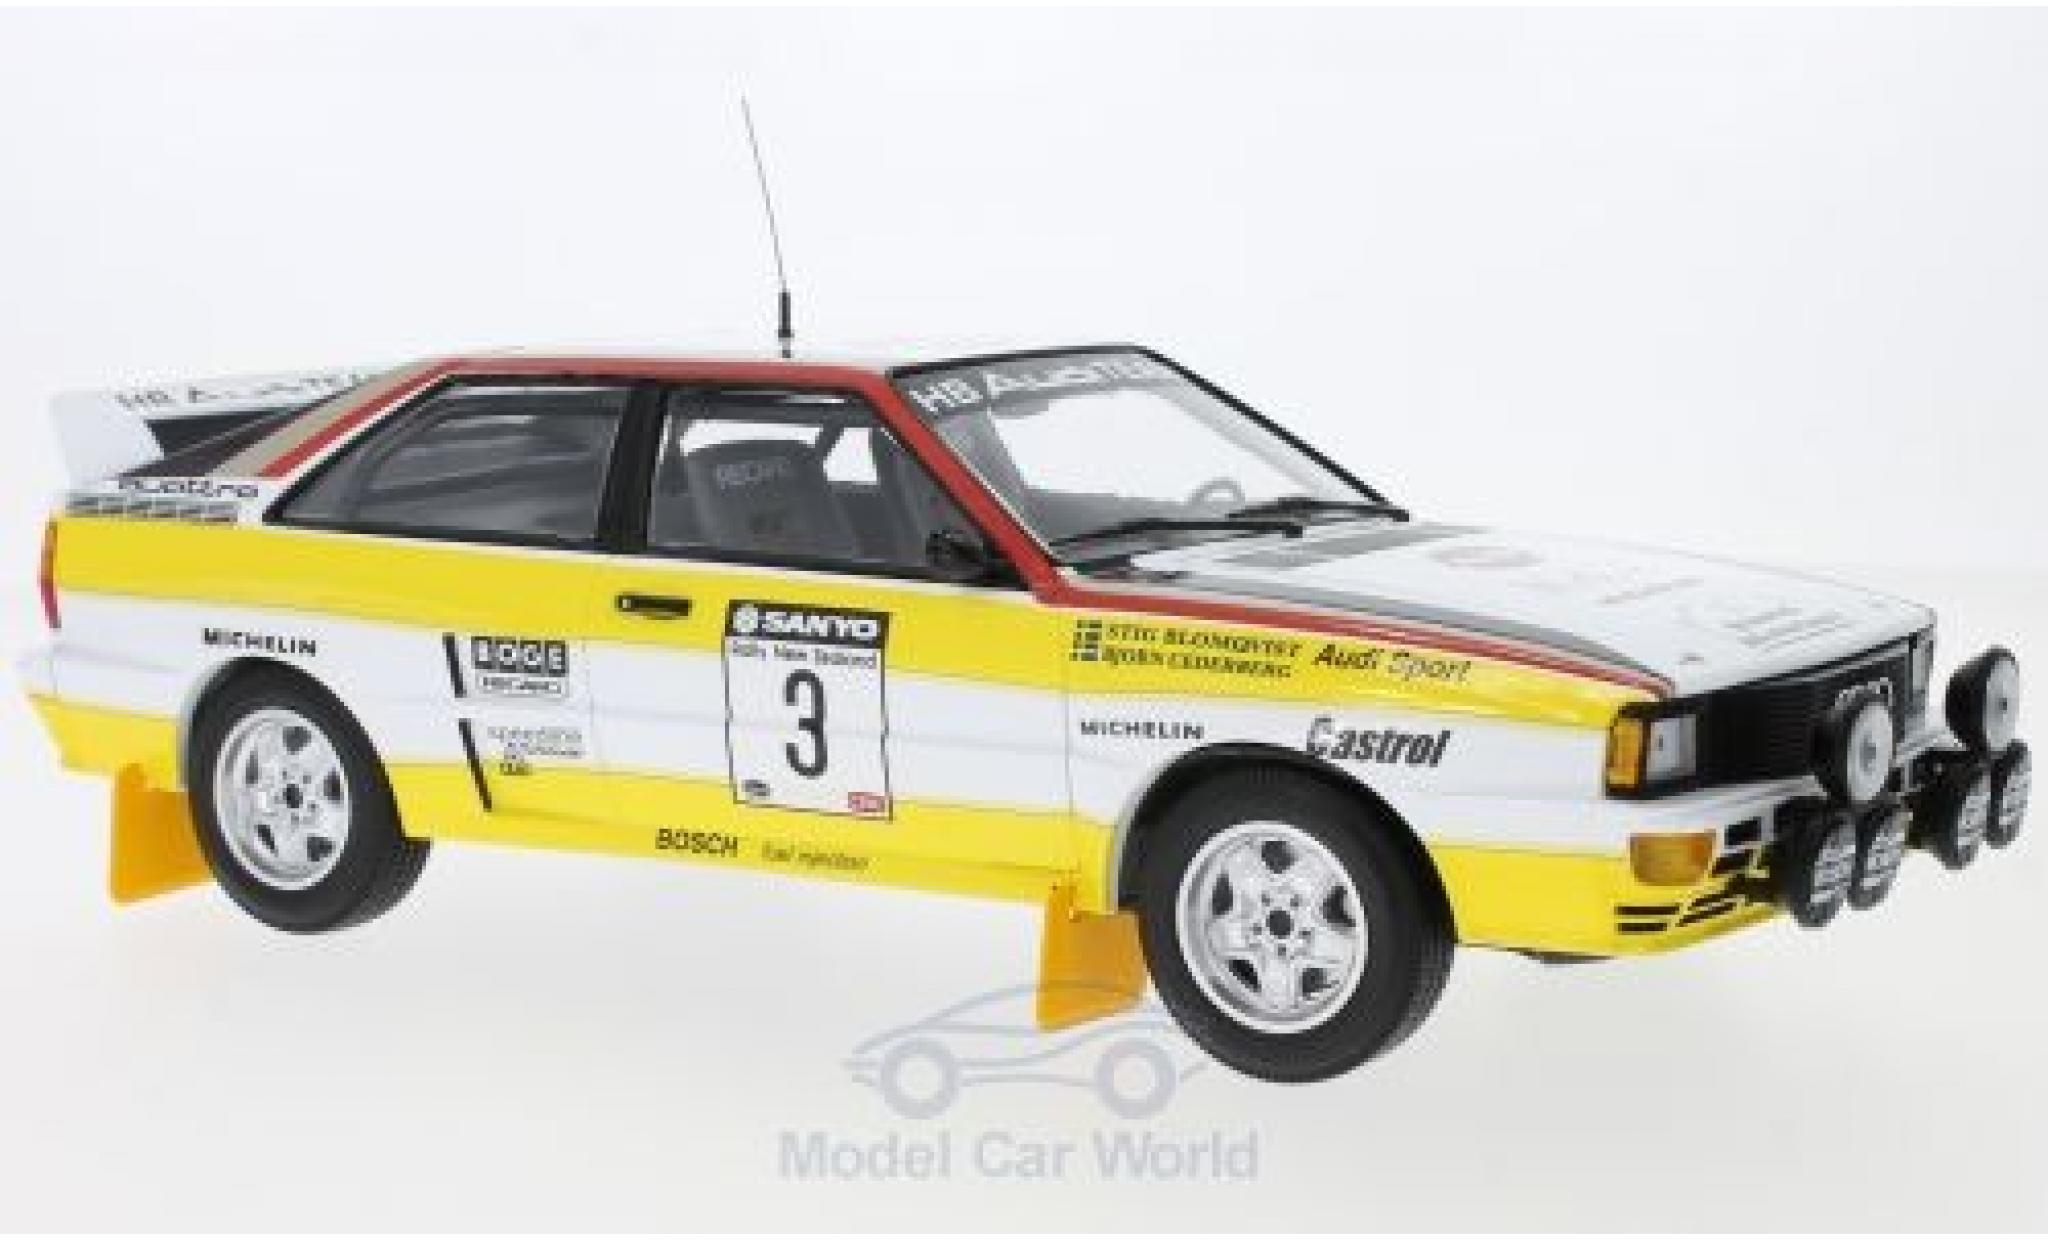 Audi Quattro 1/18 Minichamps quattro A2 No.3 Sport Rallye Neuseeland 1984 S.Blomqvist/B.Cederberg